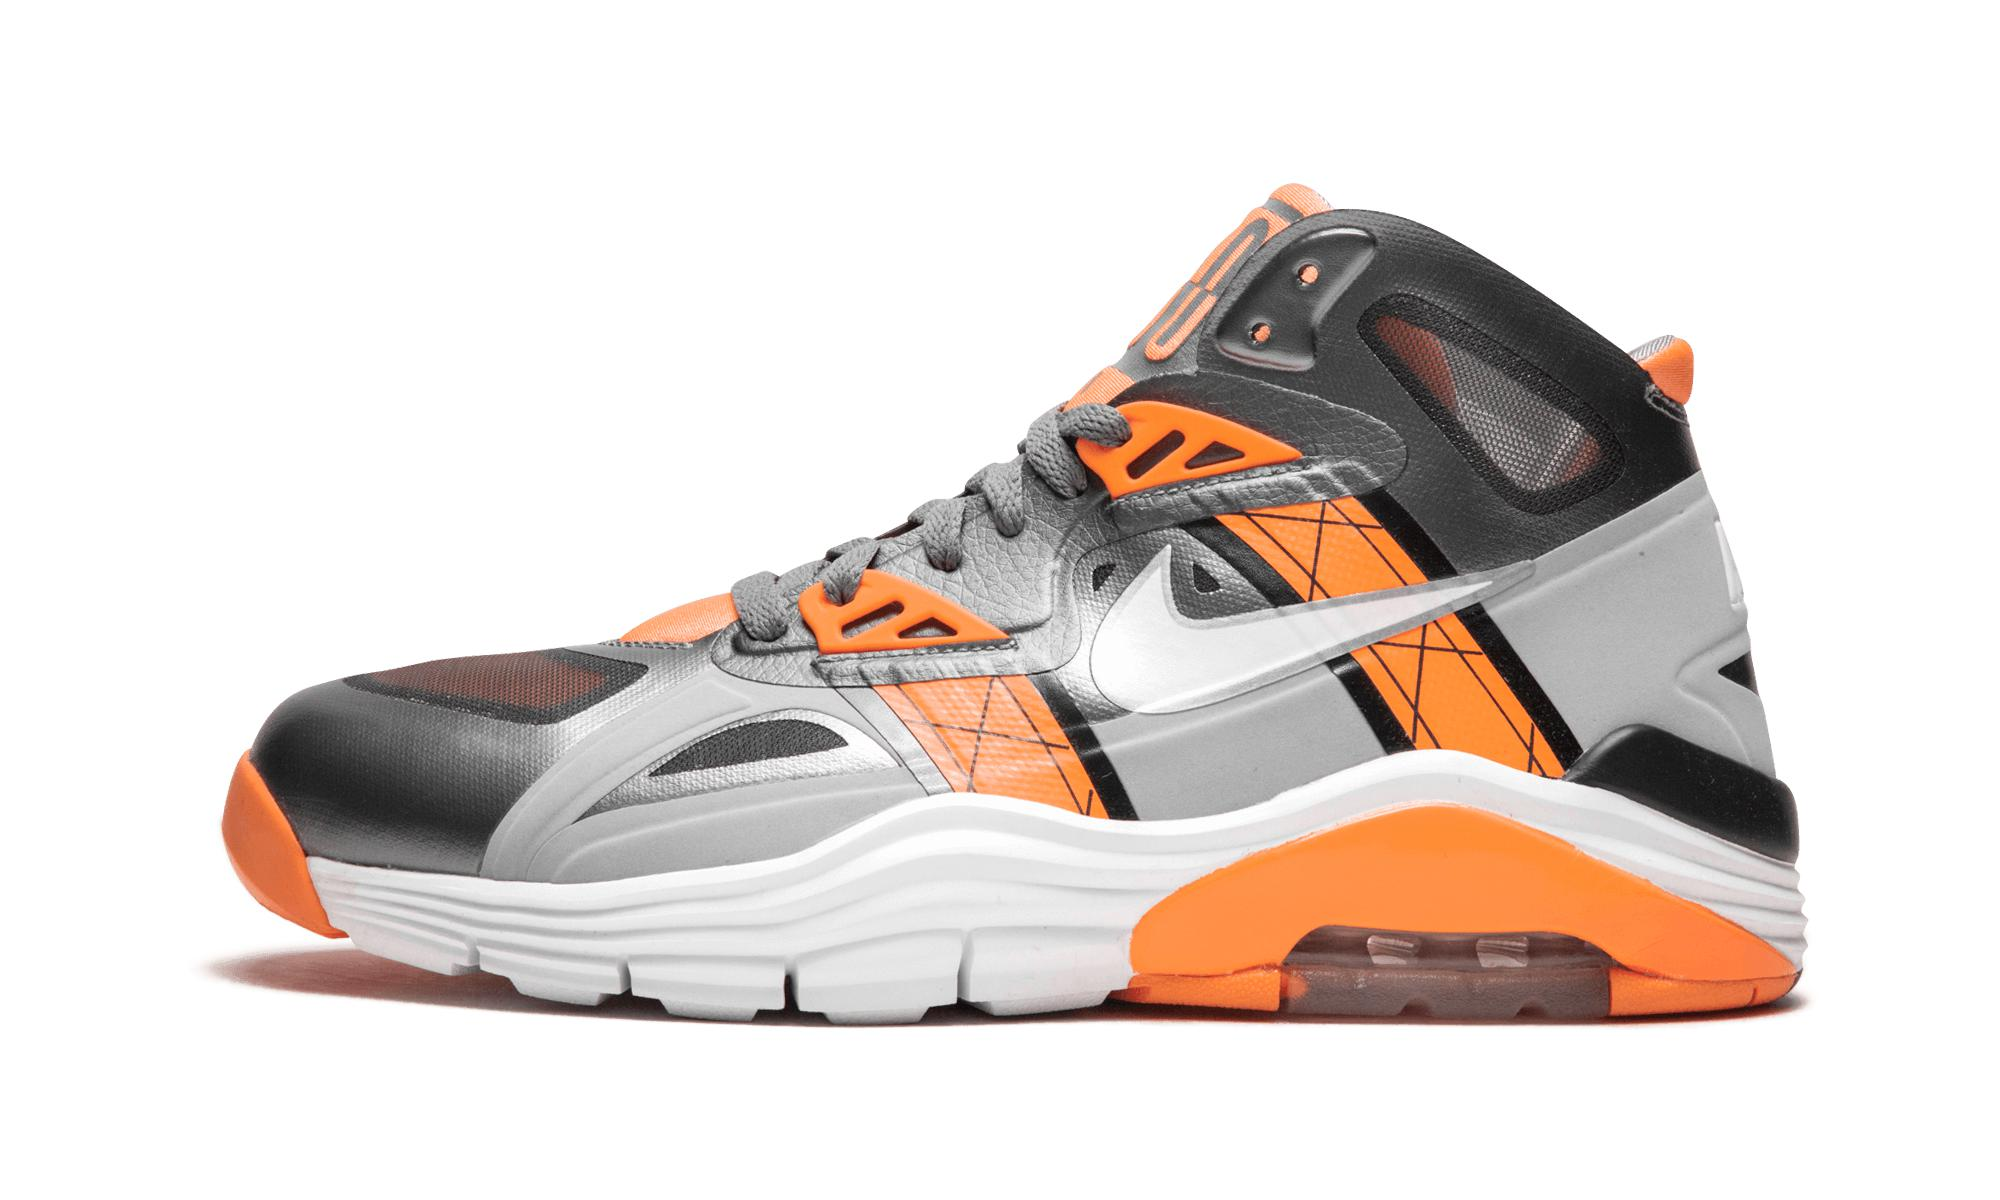 9b54d920b13d Lyst - Nike Lunar 180 Trainer Sc for Men